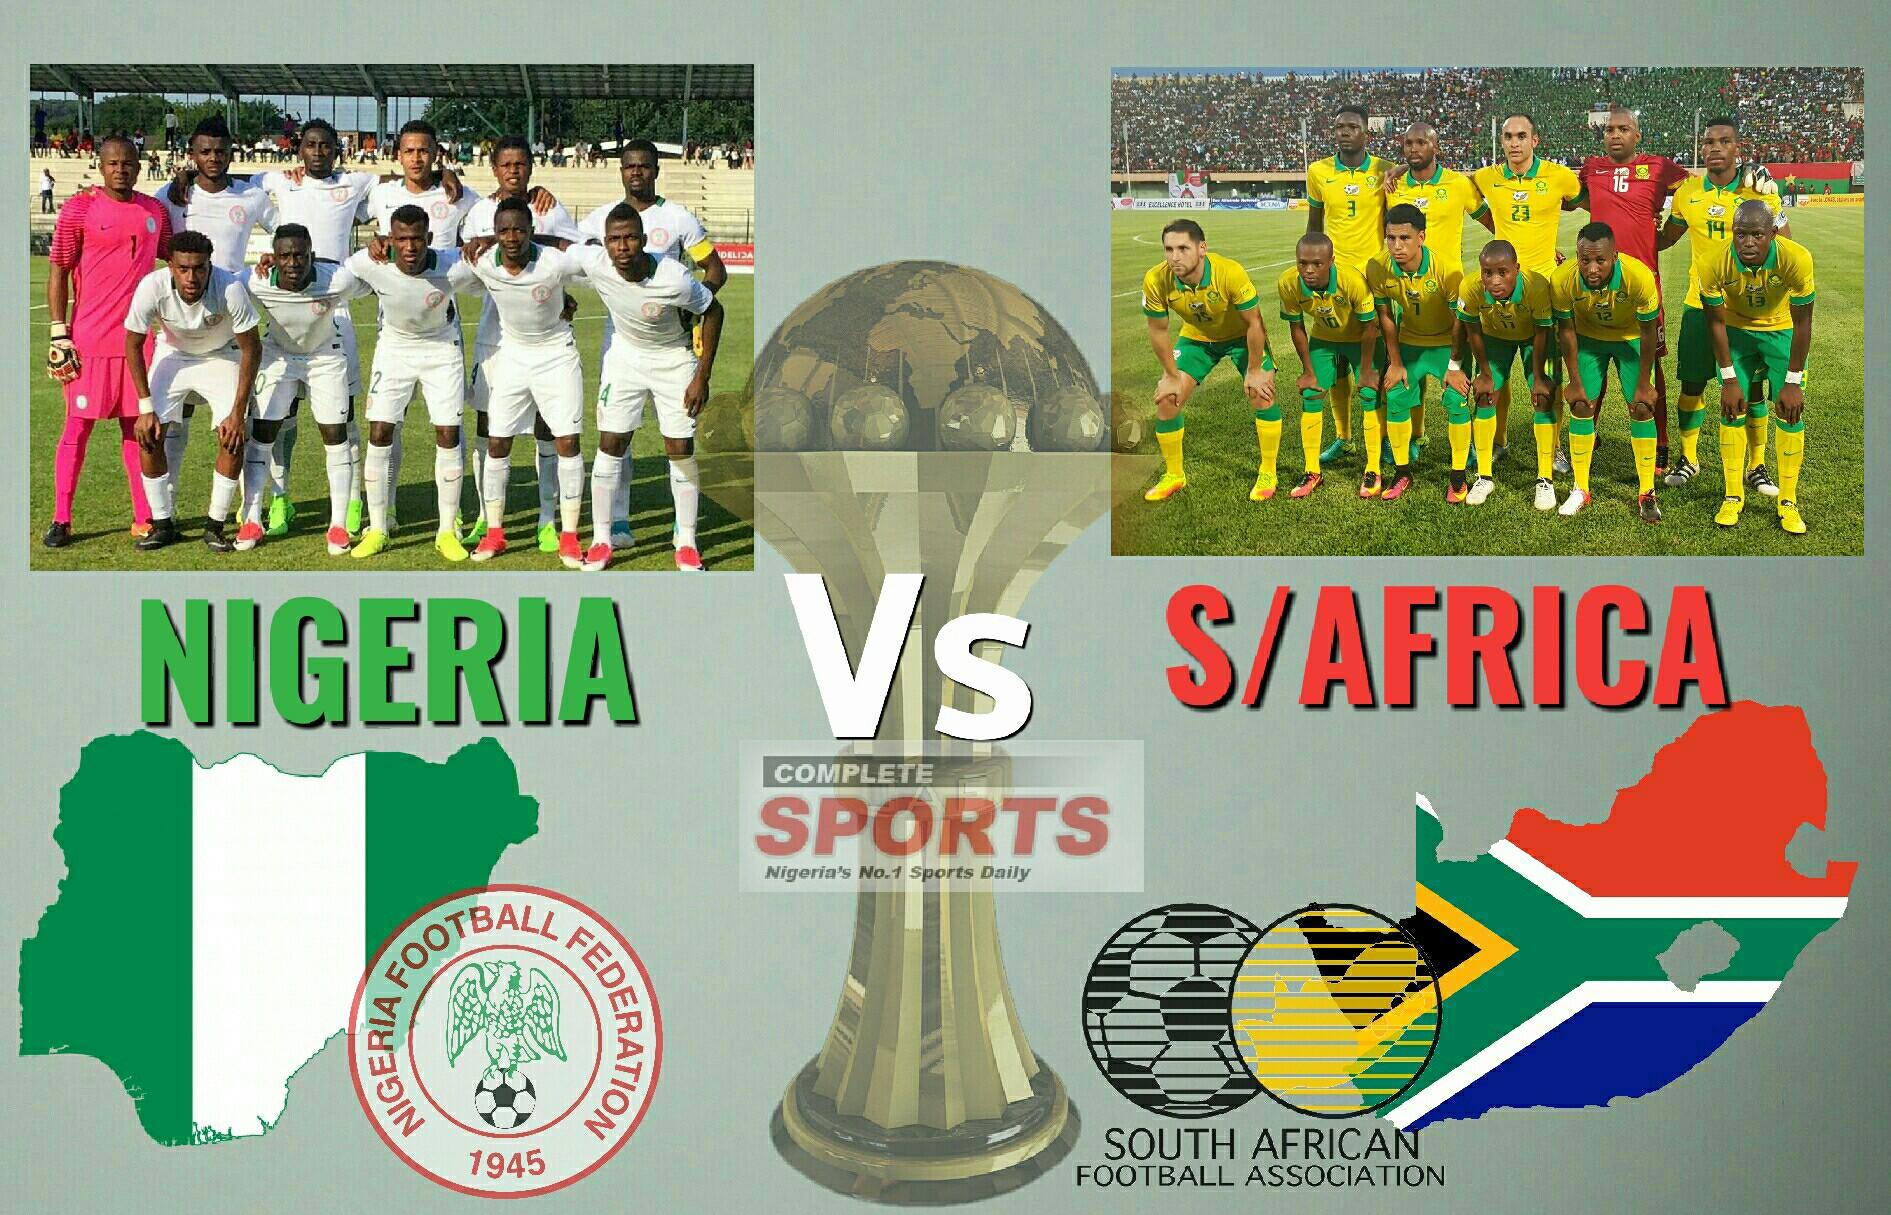 LIVE BLOGGING: Nigeria vs South Africa